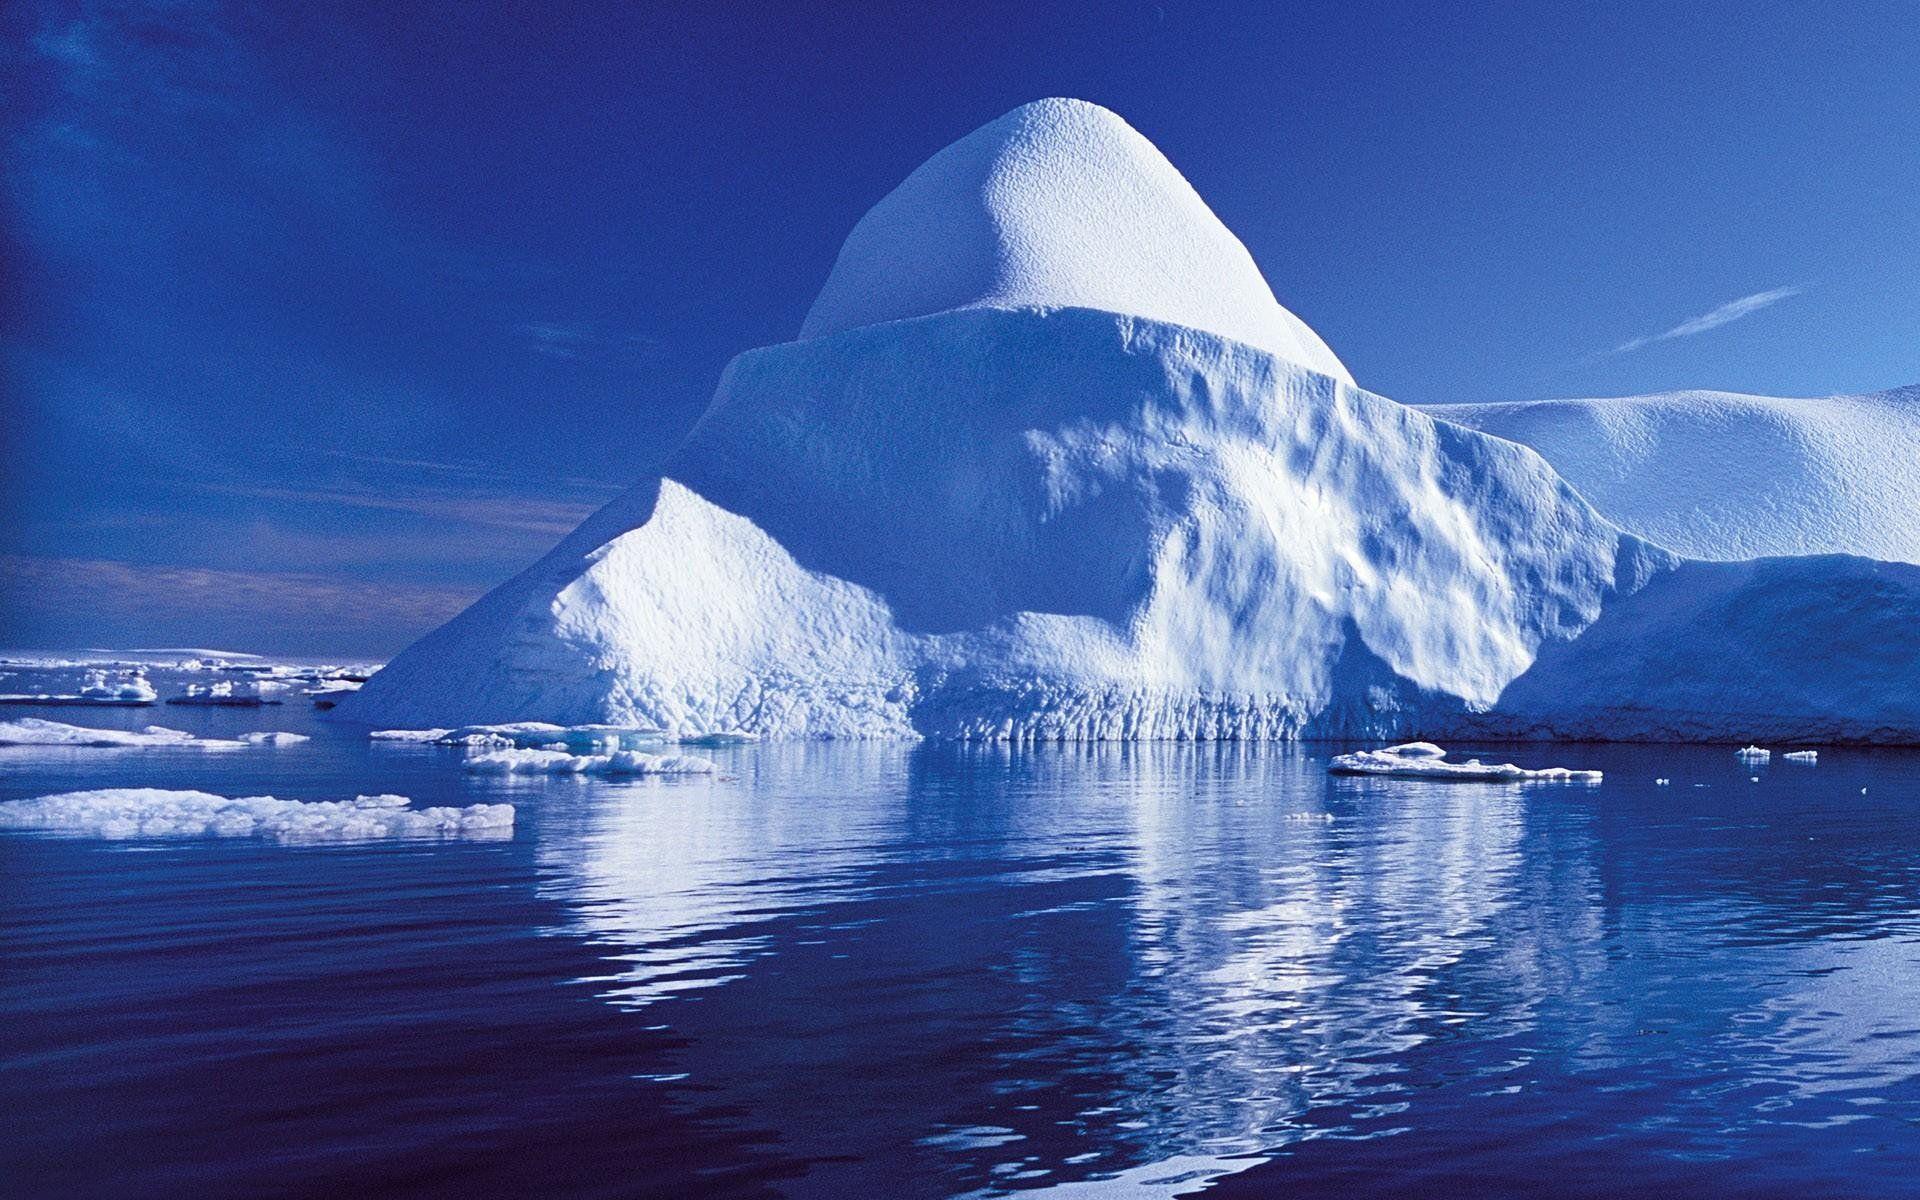 Blue Ice Glacier Wallpaper